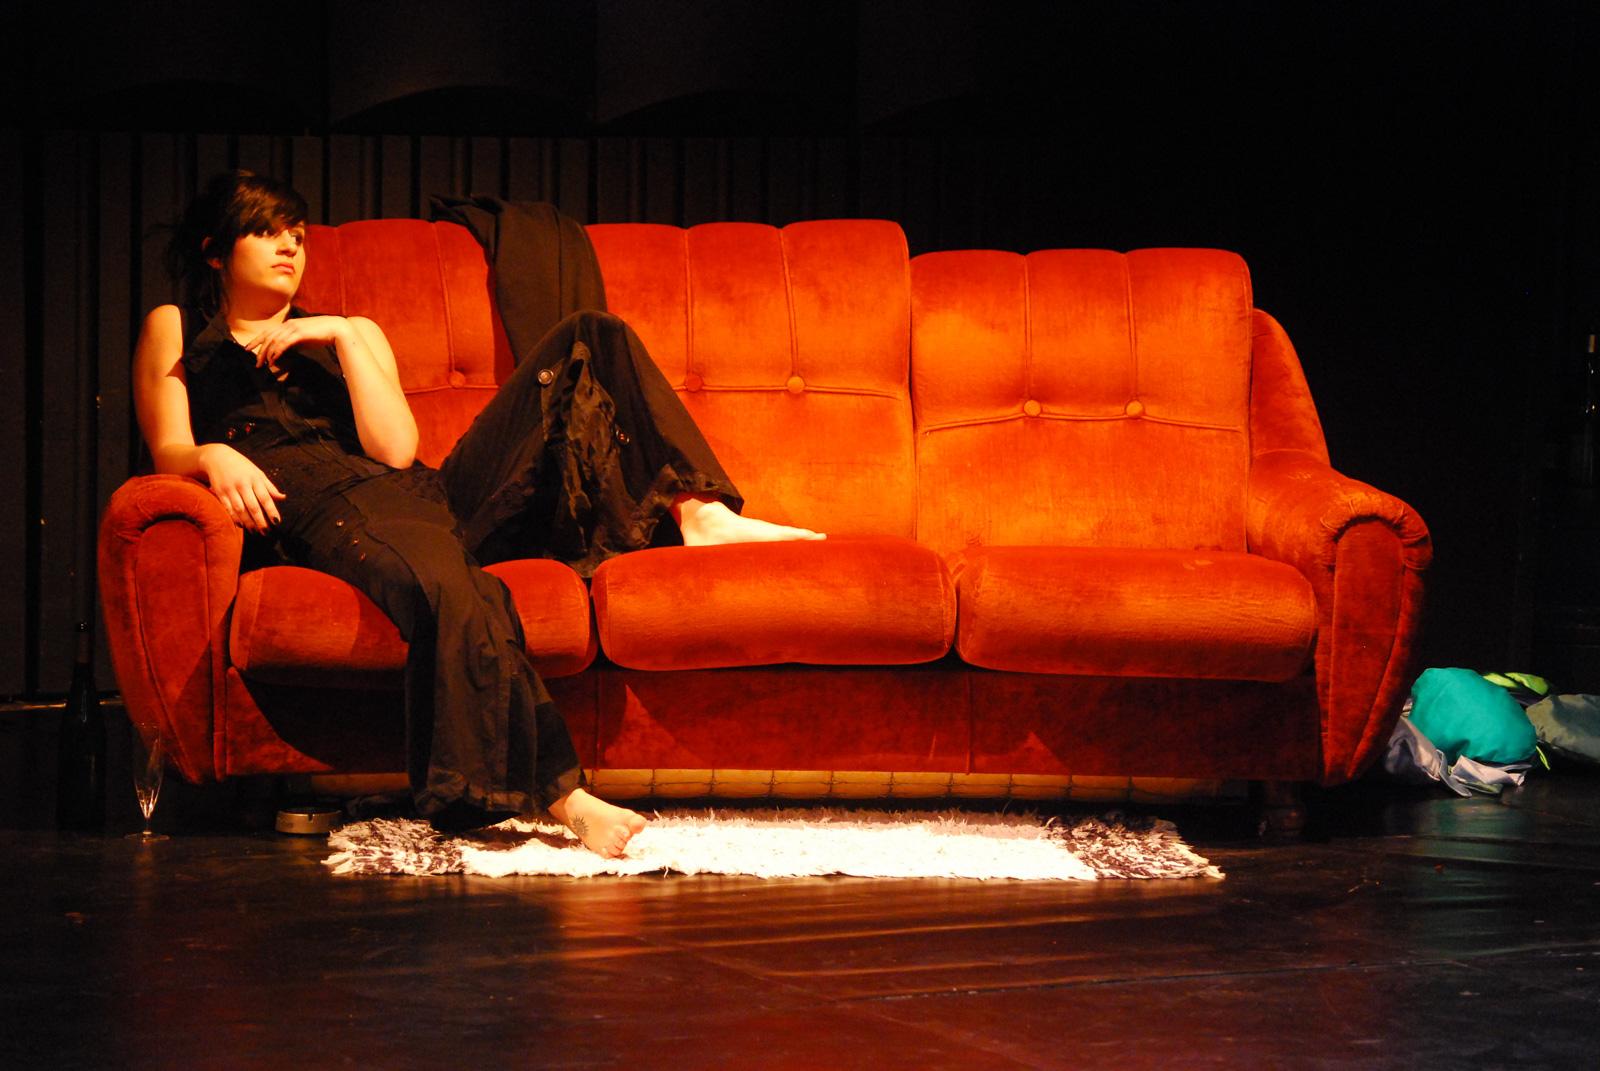 Teatro_Magico_Fantastico_10.jpg